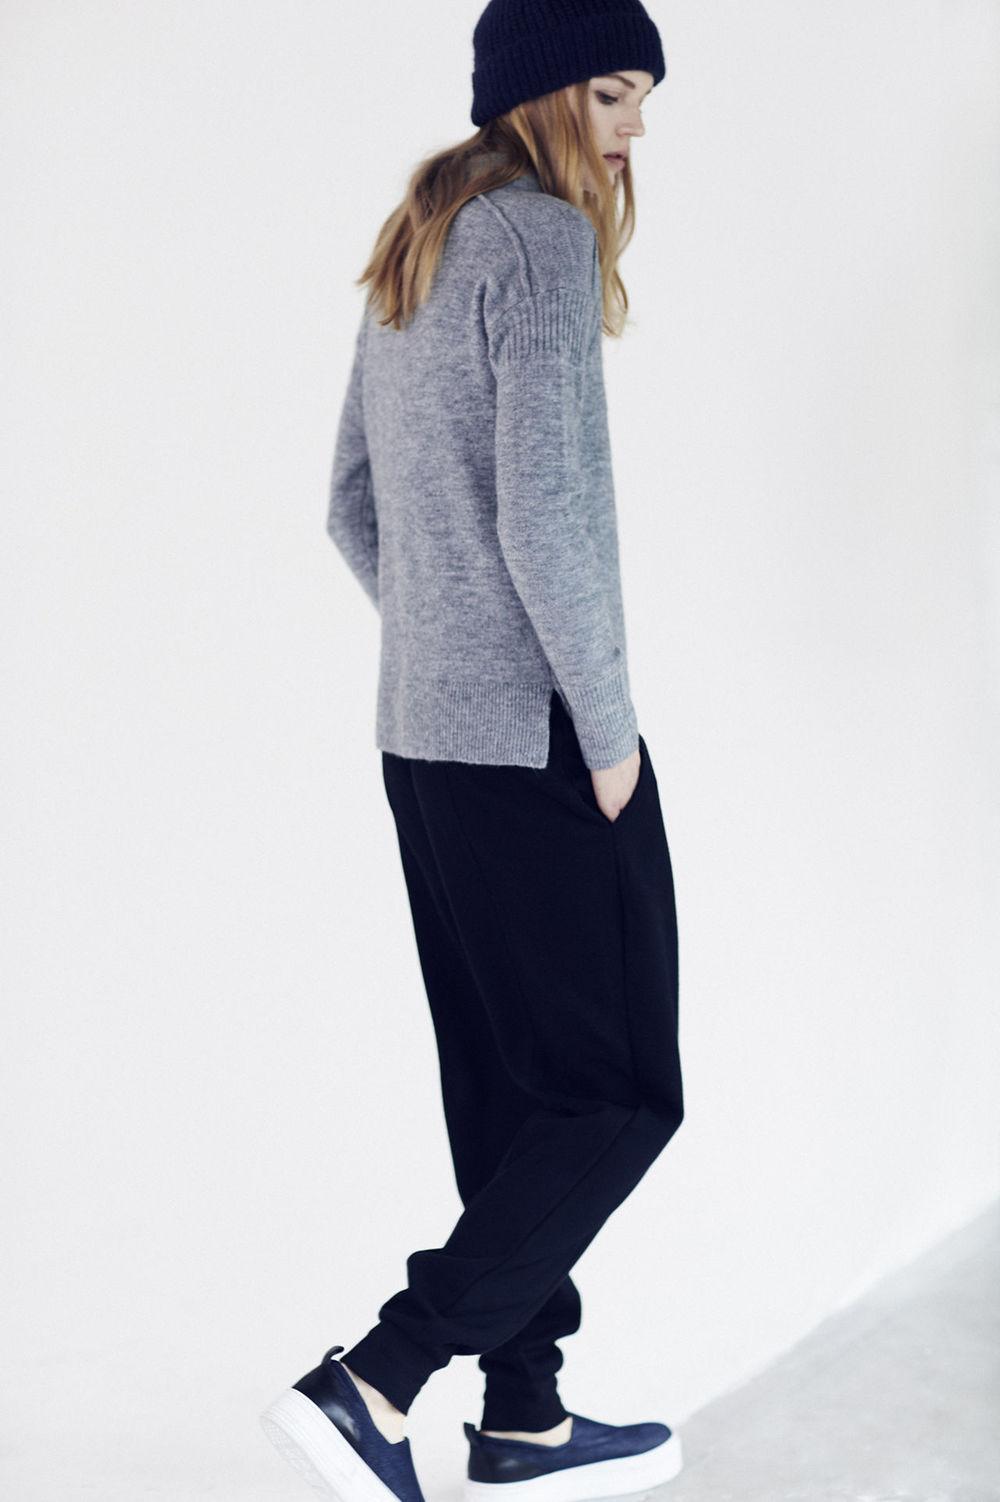 whistles_knitwear_aw14_13_004fe780500784.jpg